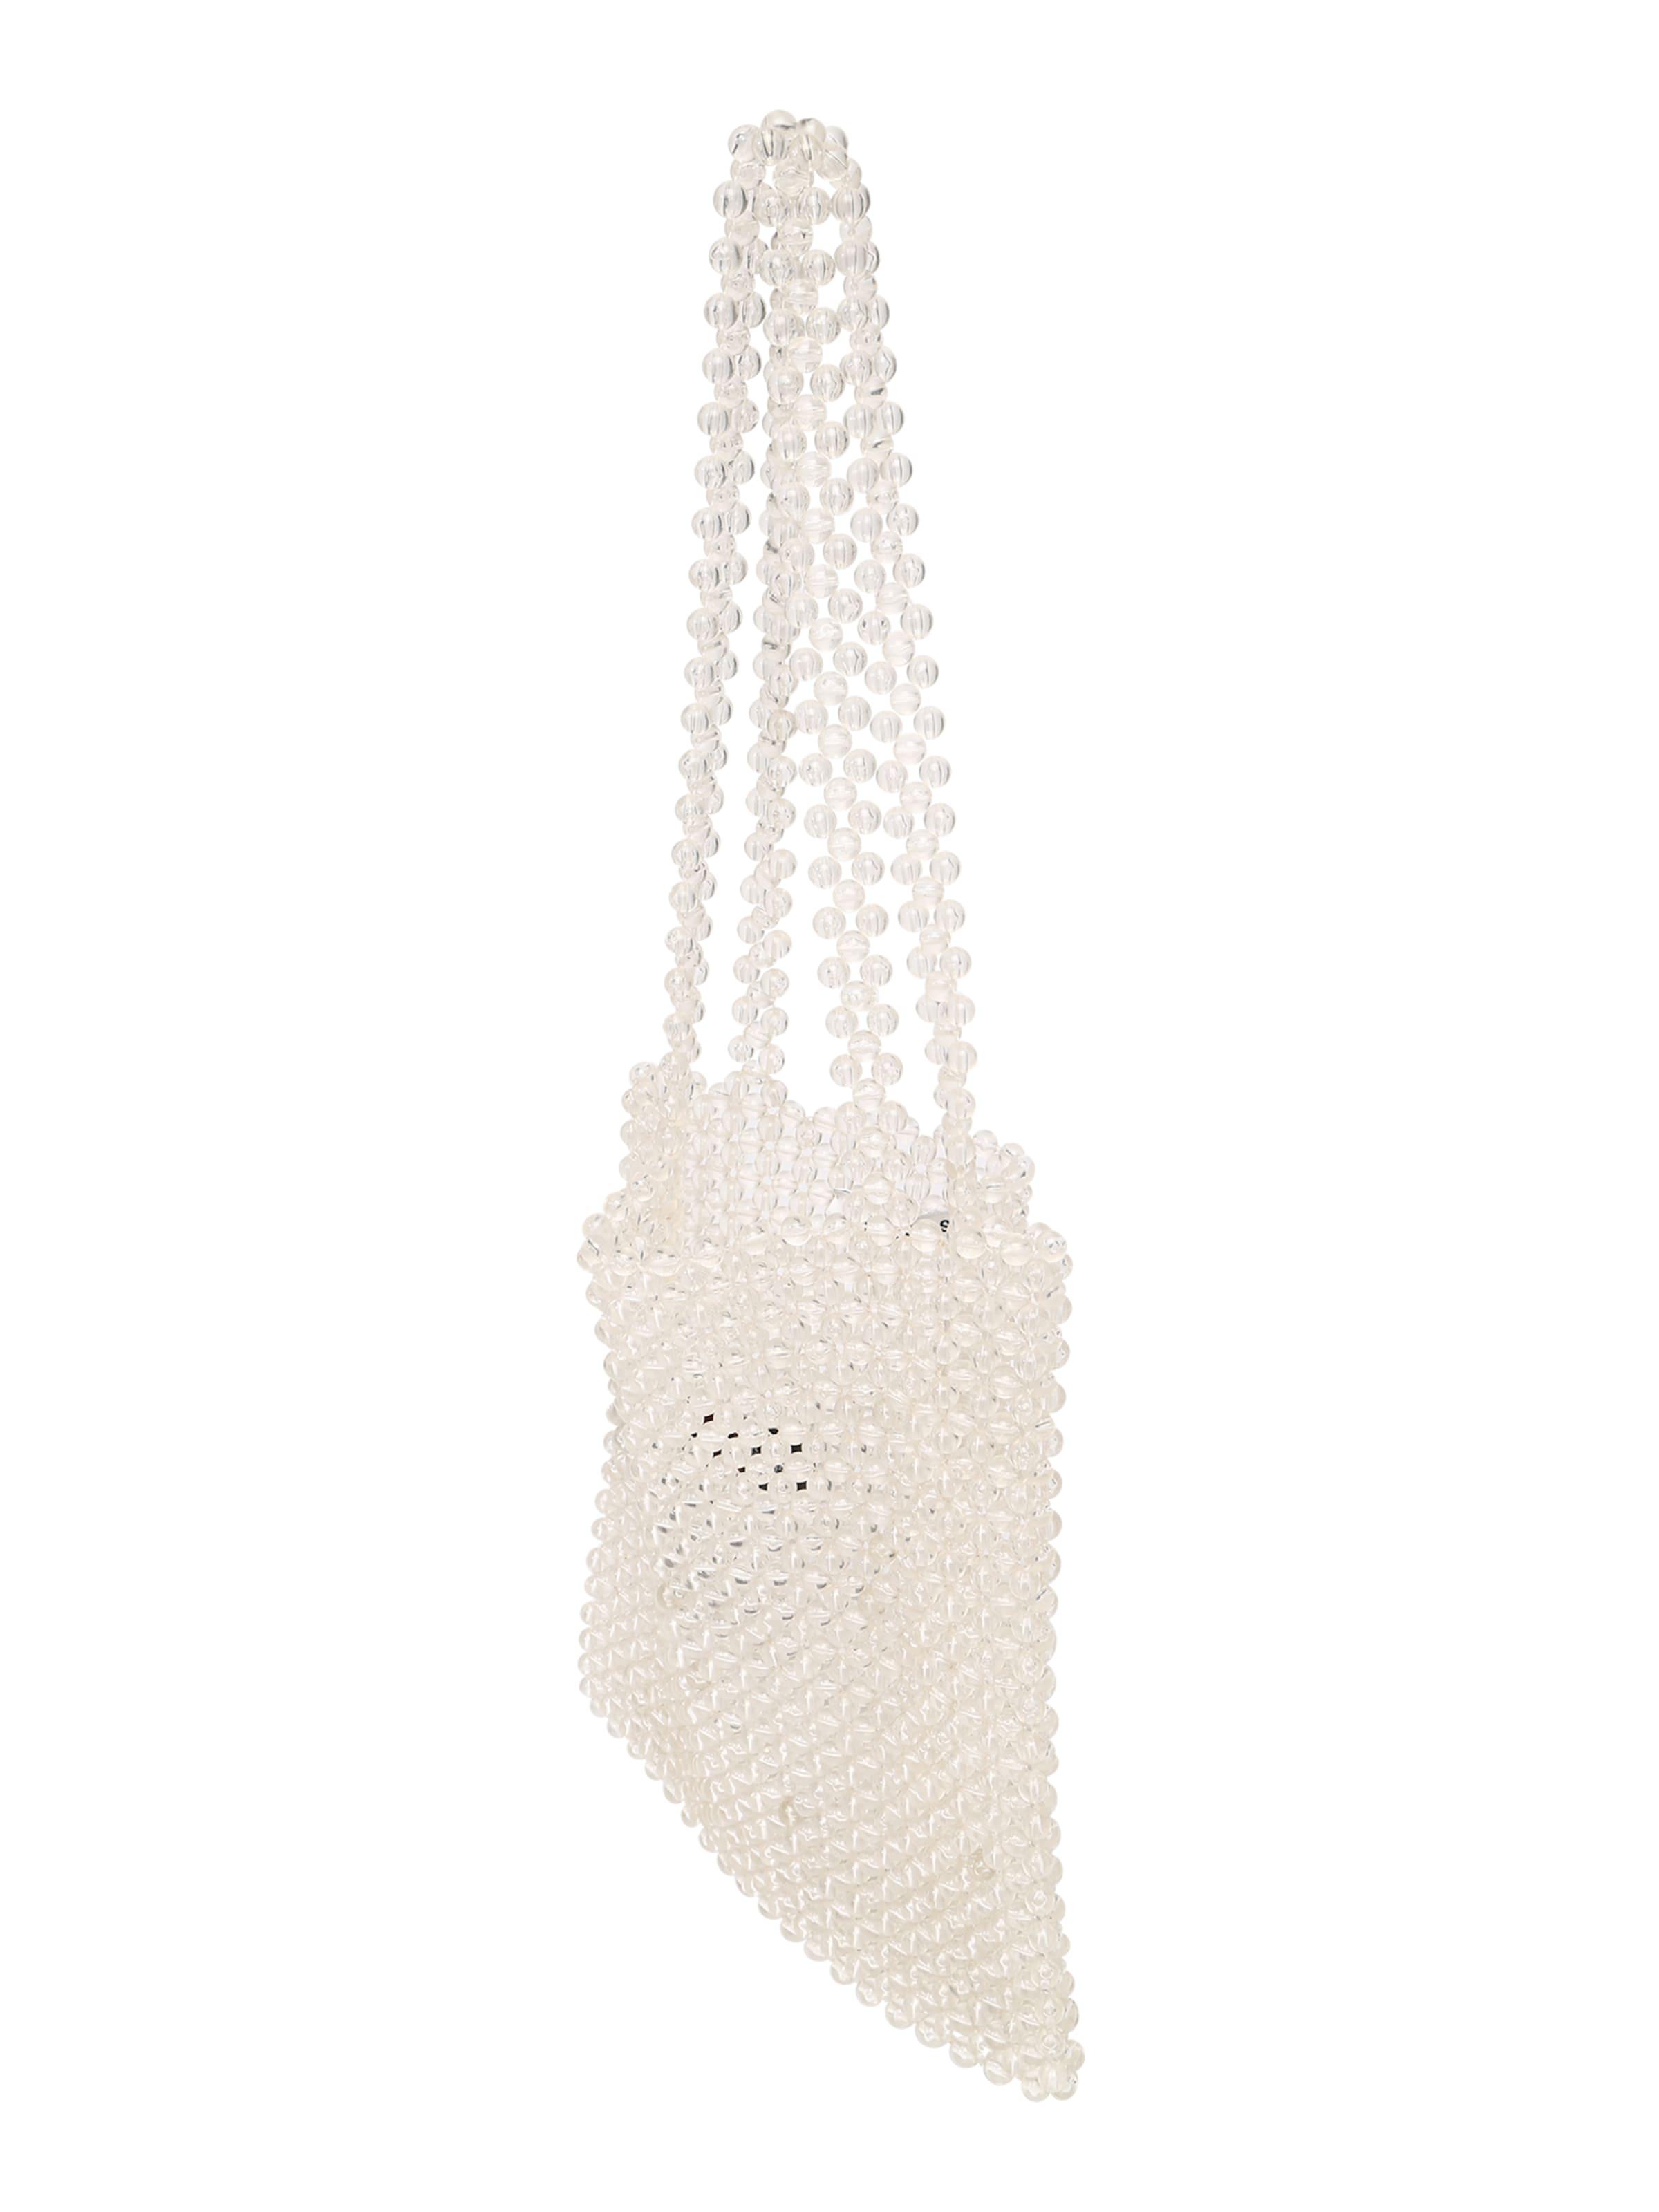 Transparent Pieces Pieces Tasche In Transparent Tasche 'jearl' Pieces 'jearl' Tasche In mNn0v8w